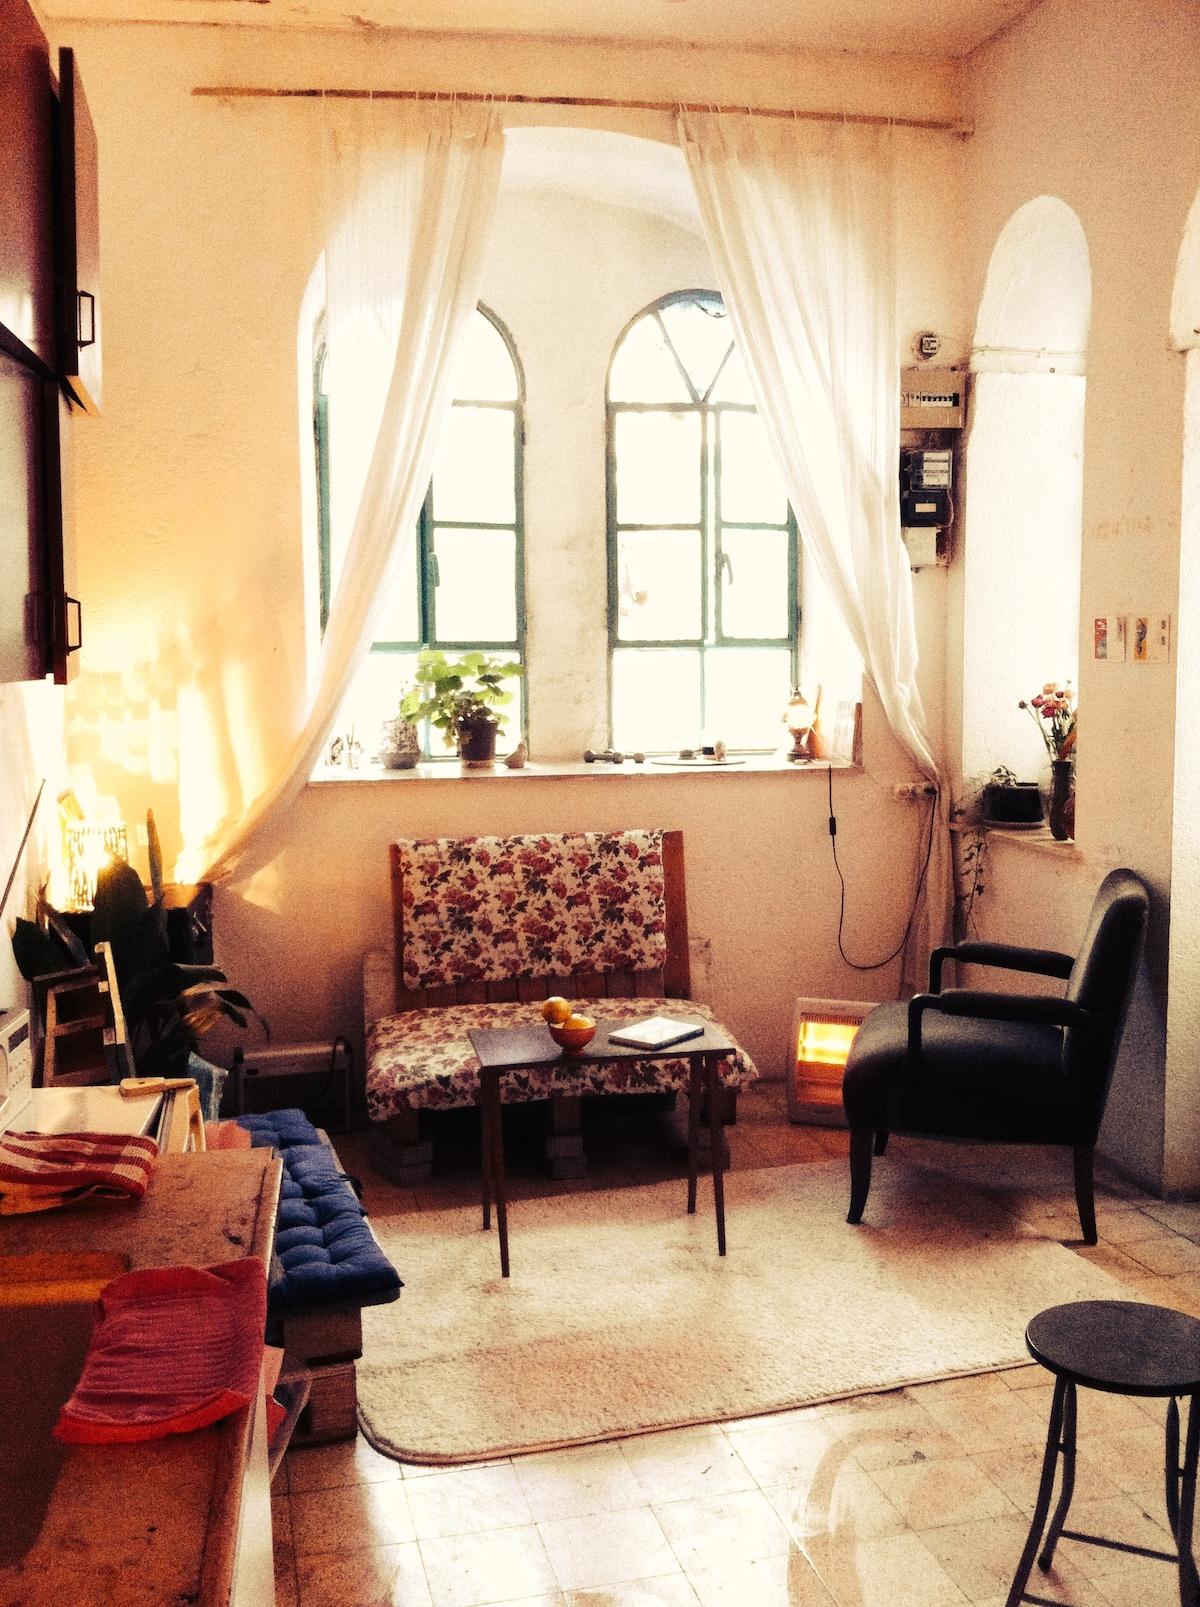 Studio in Nahlaot Jerusalem